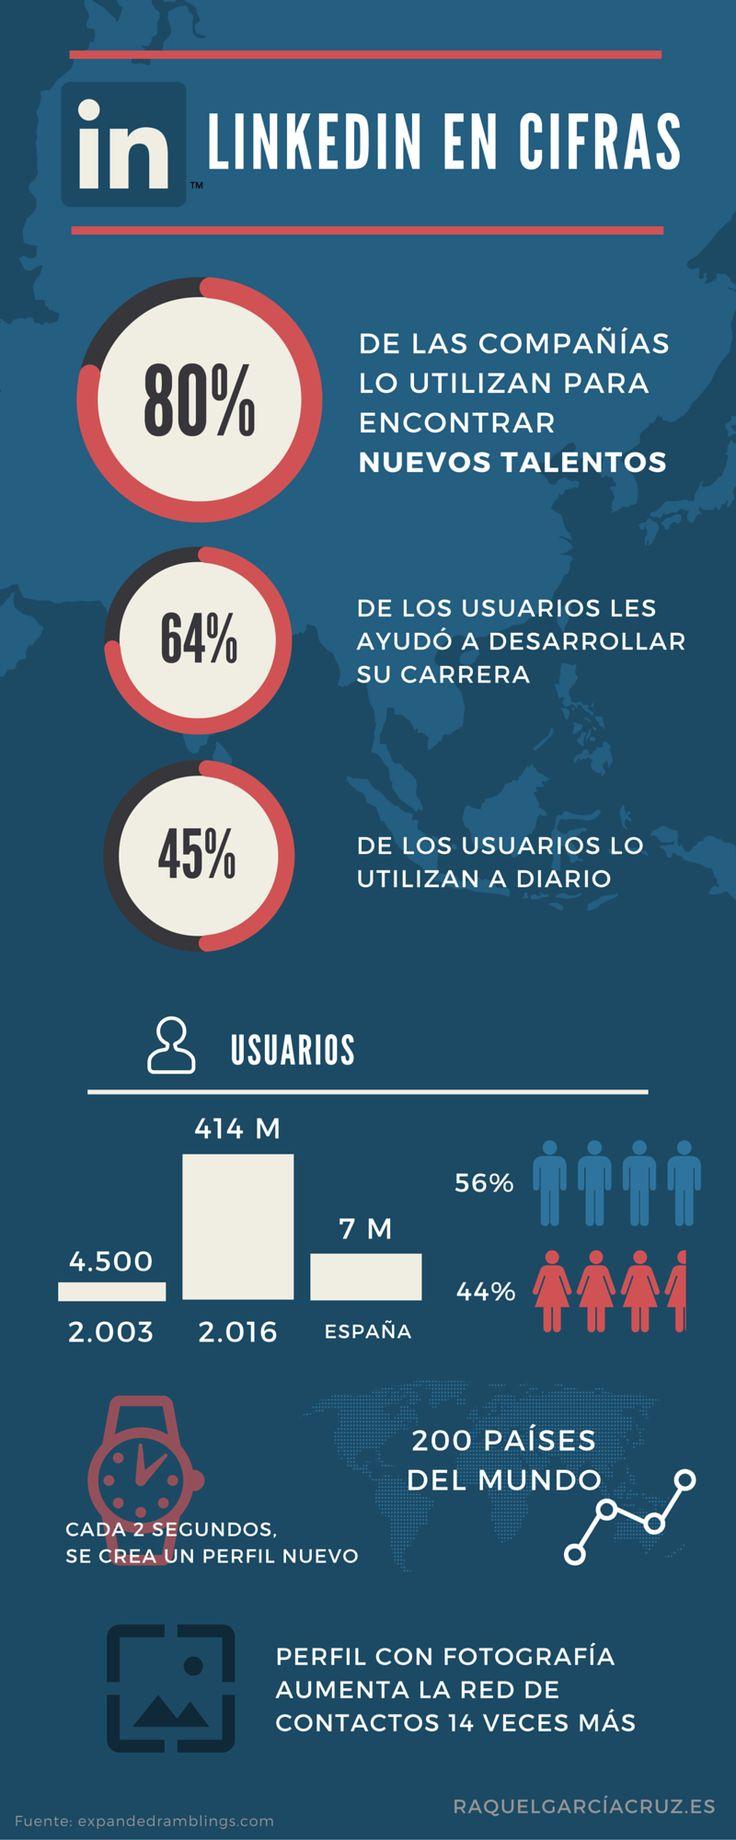 [Infografía] Datos de Linkedin que le interesan a las empresas | Raquel García Cruz